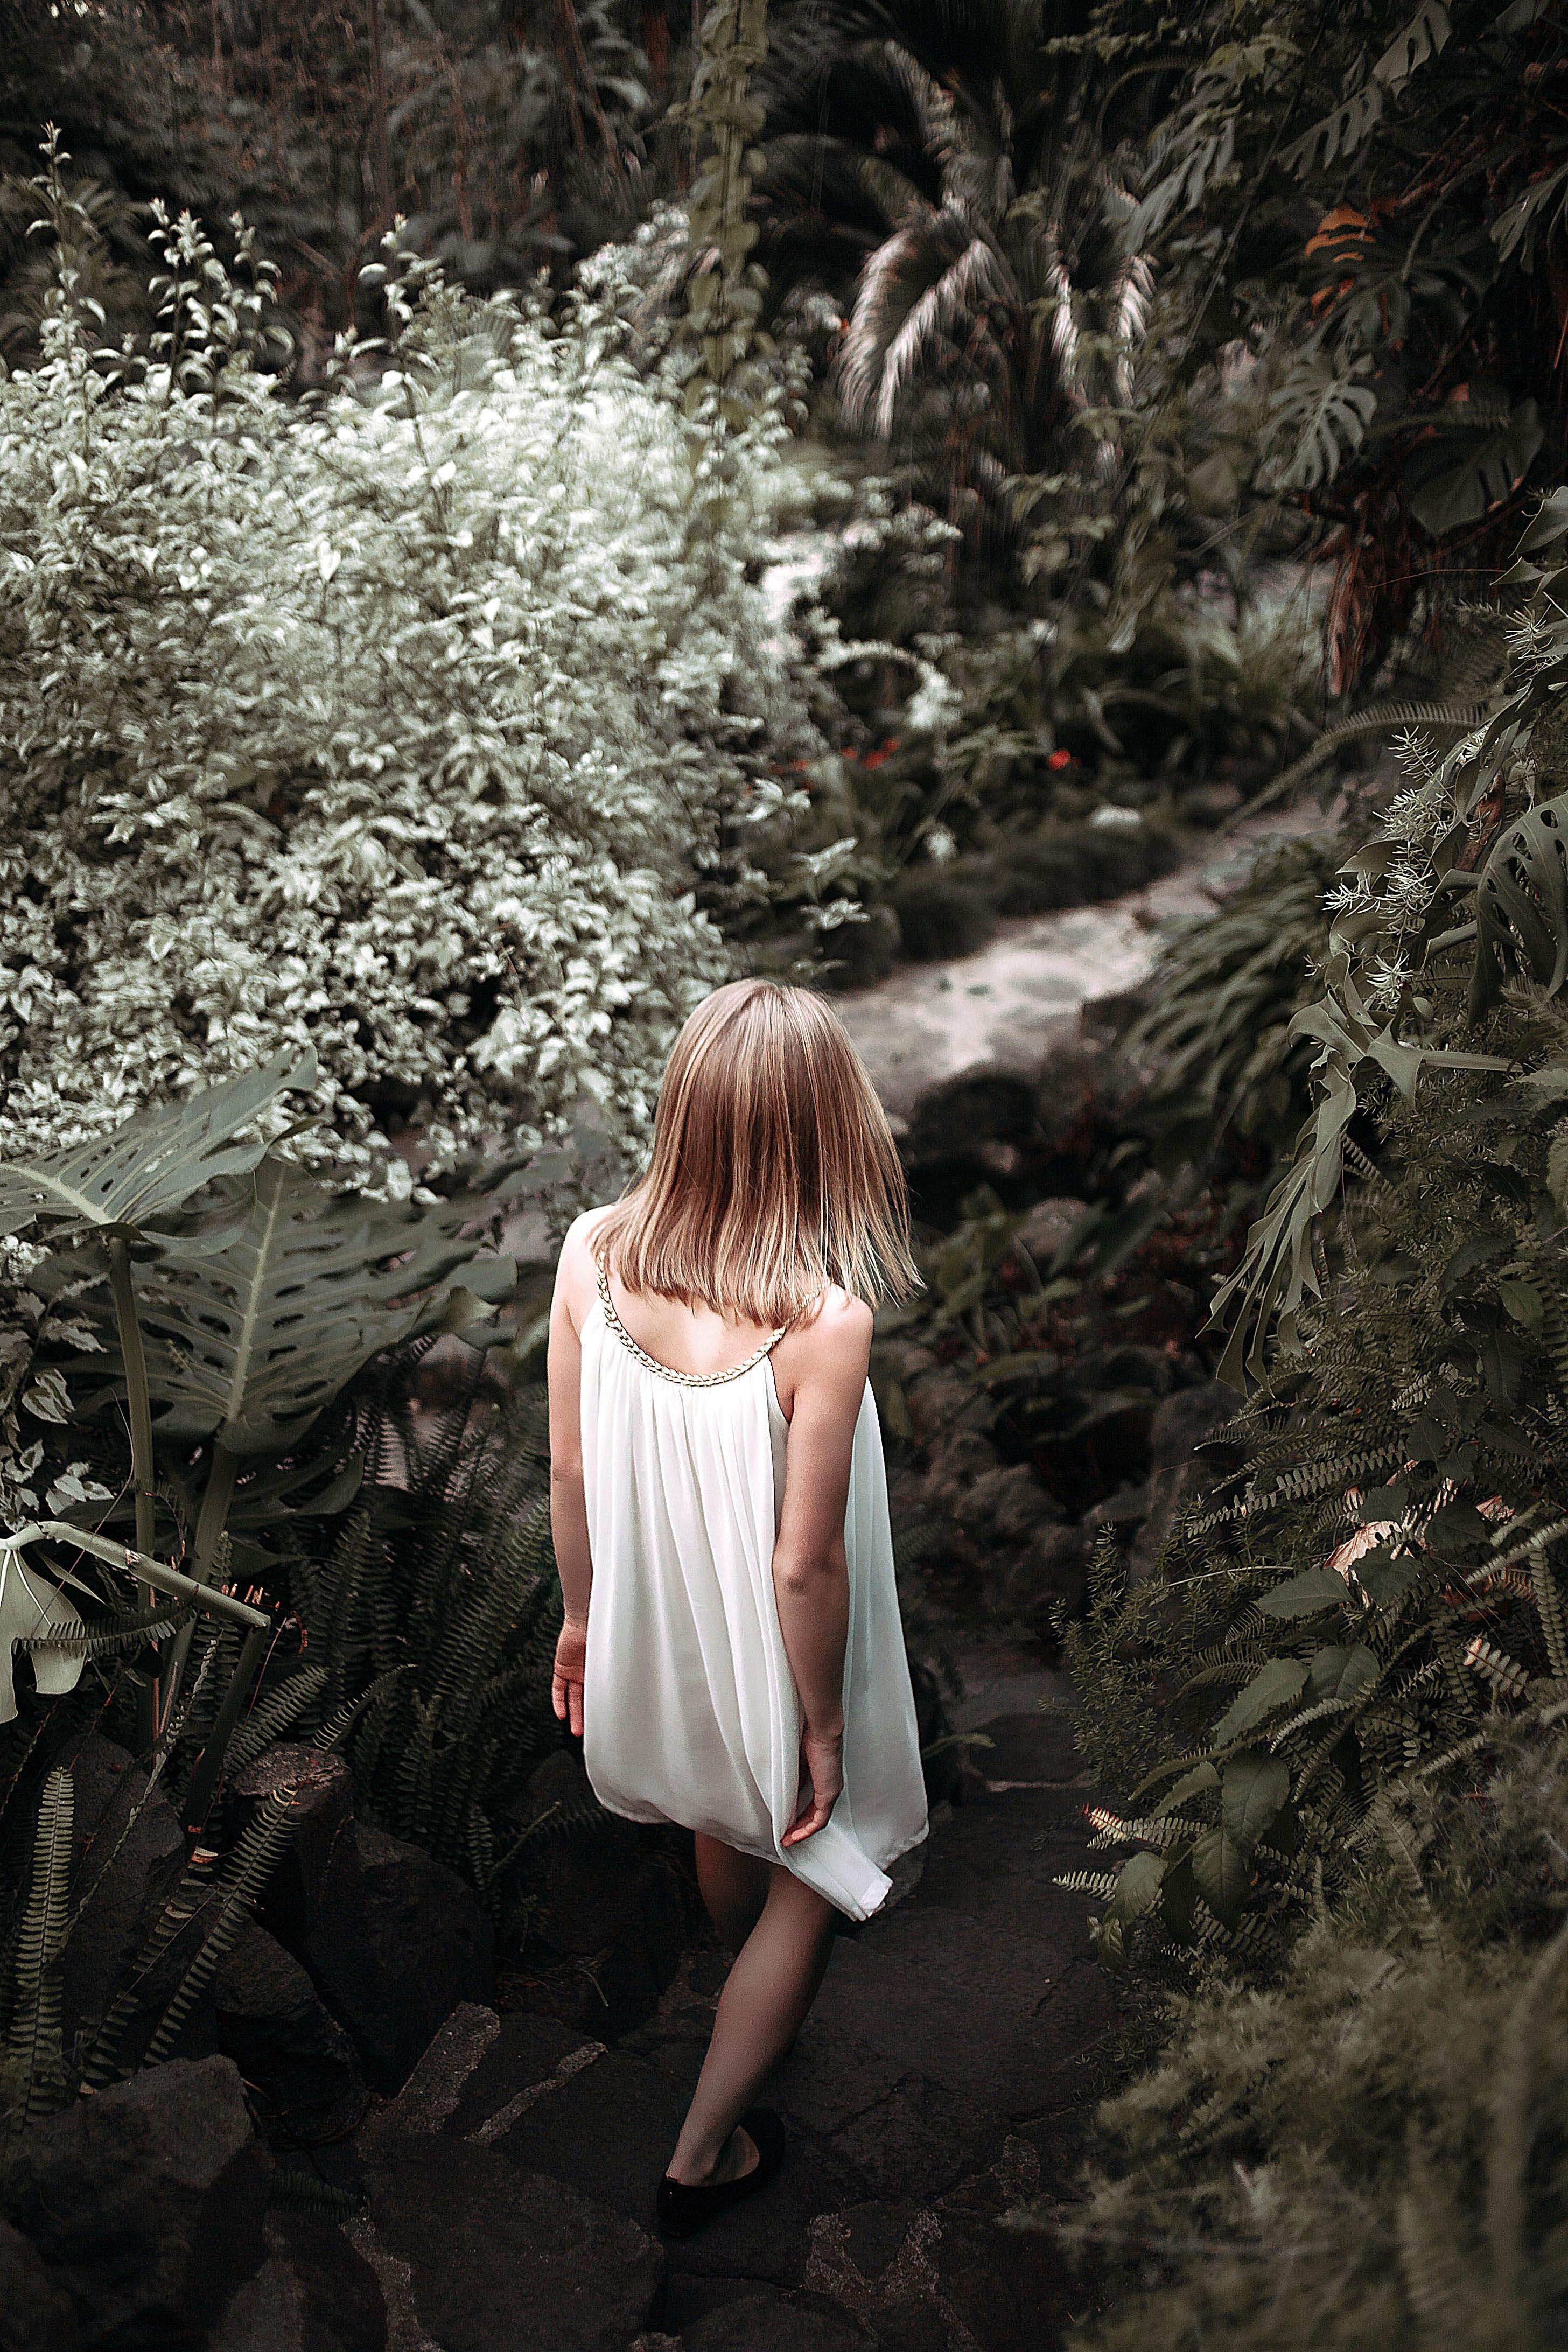 Girl exploring whimsical woods alone